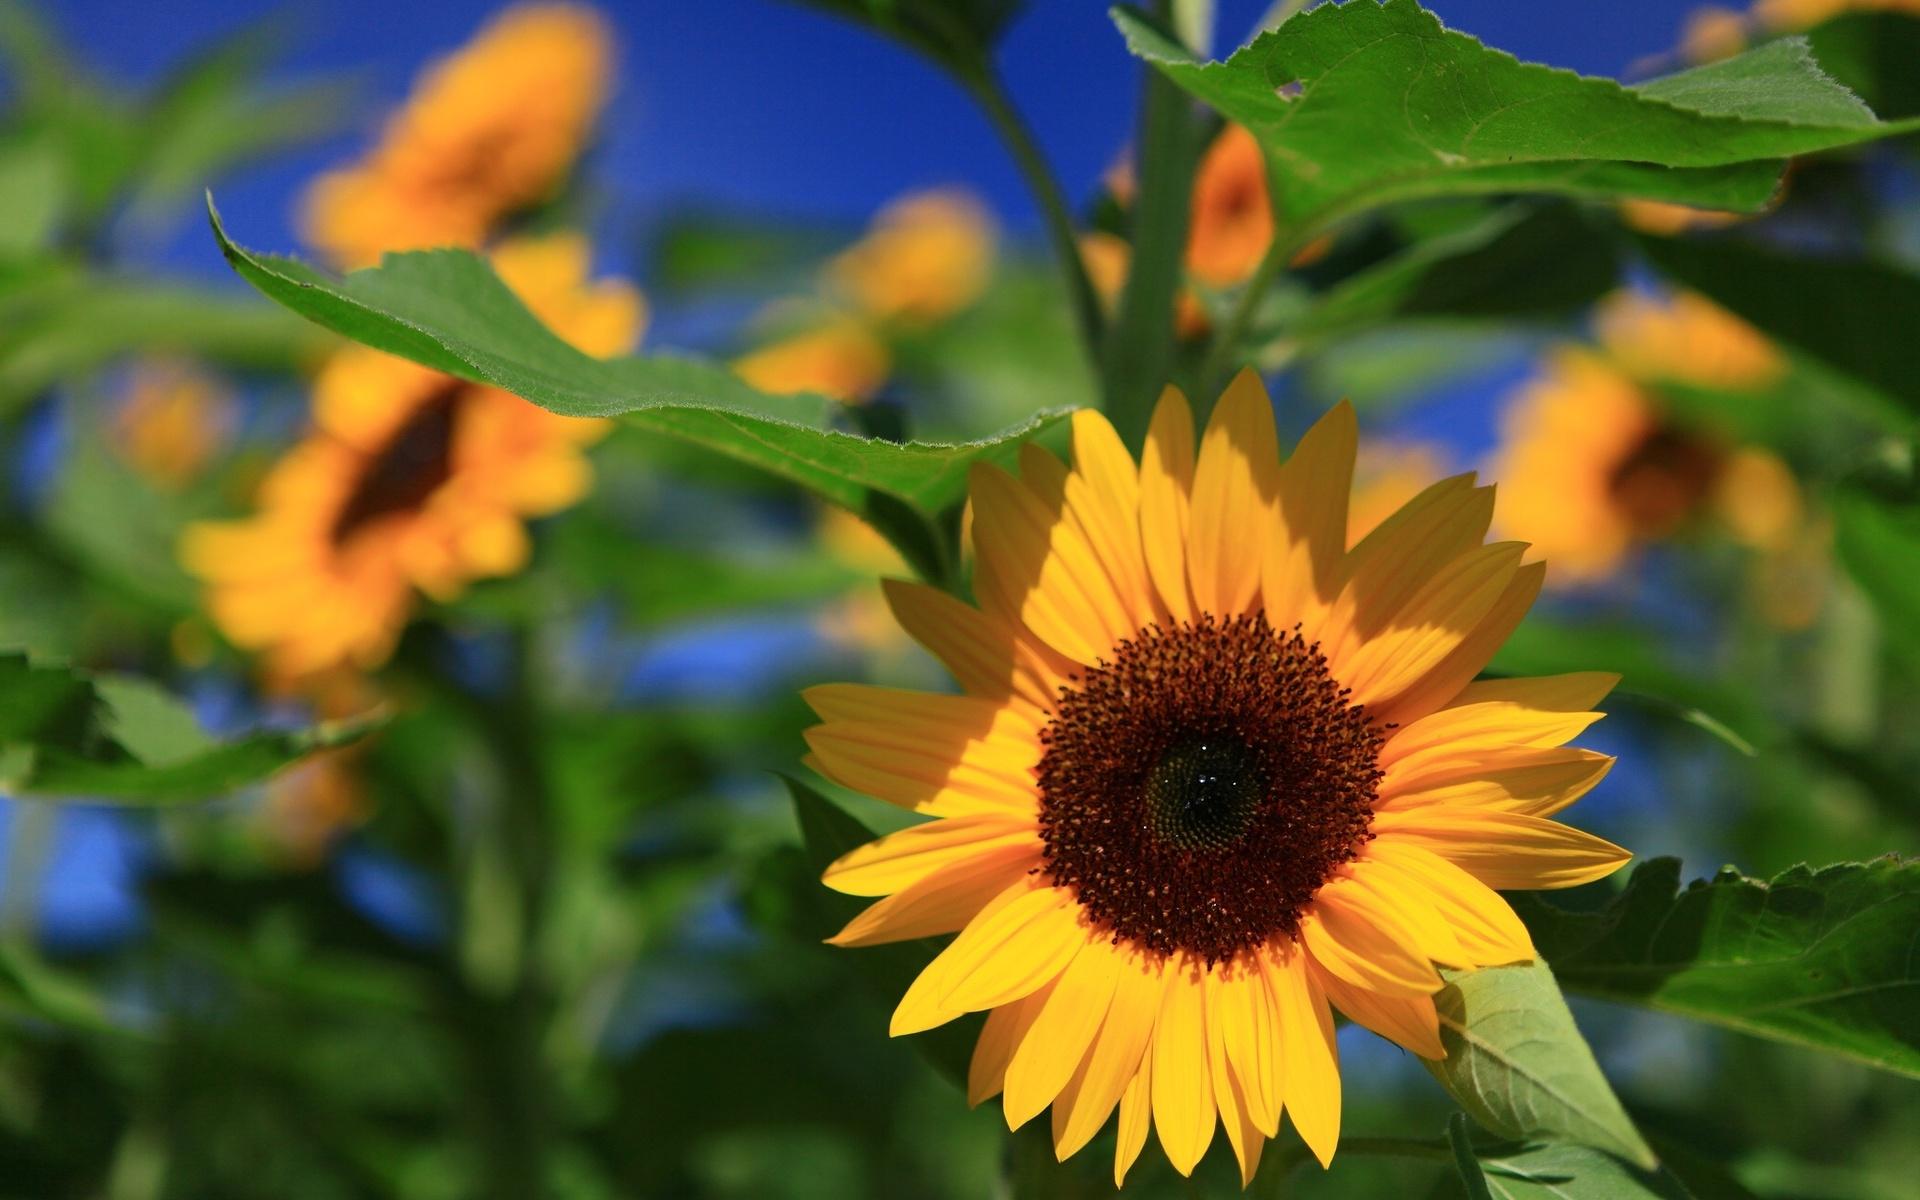 ErdeNatur Sonnenblume Wallpaper